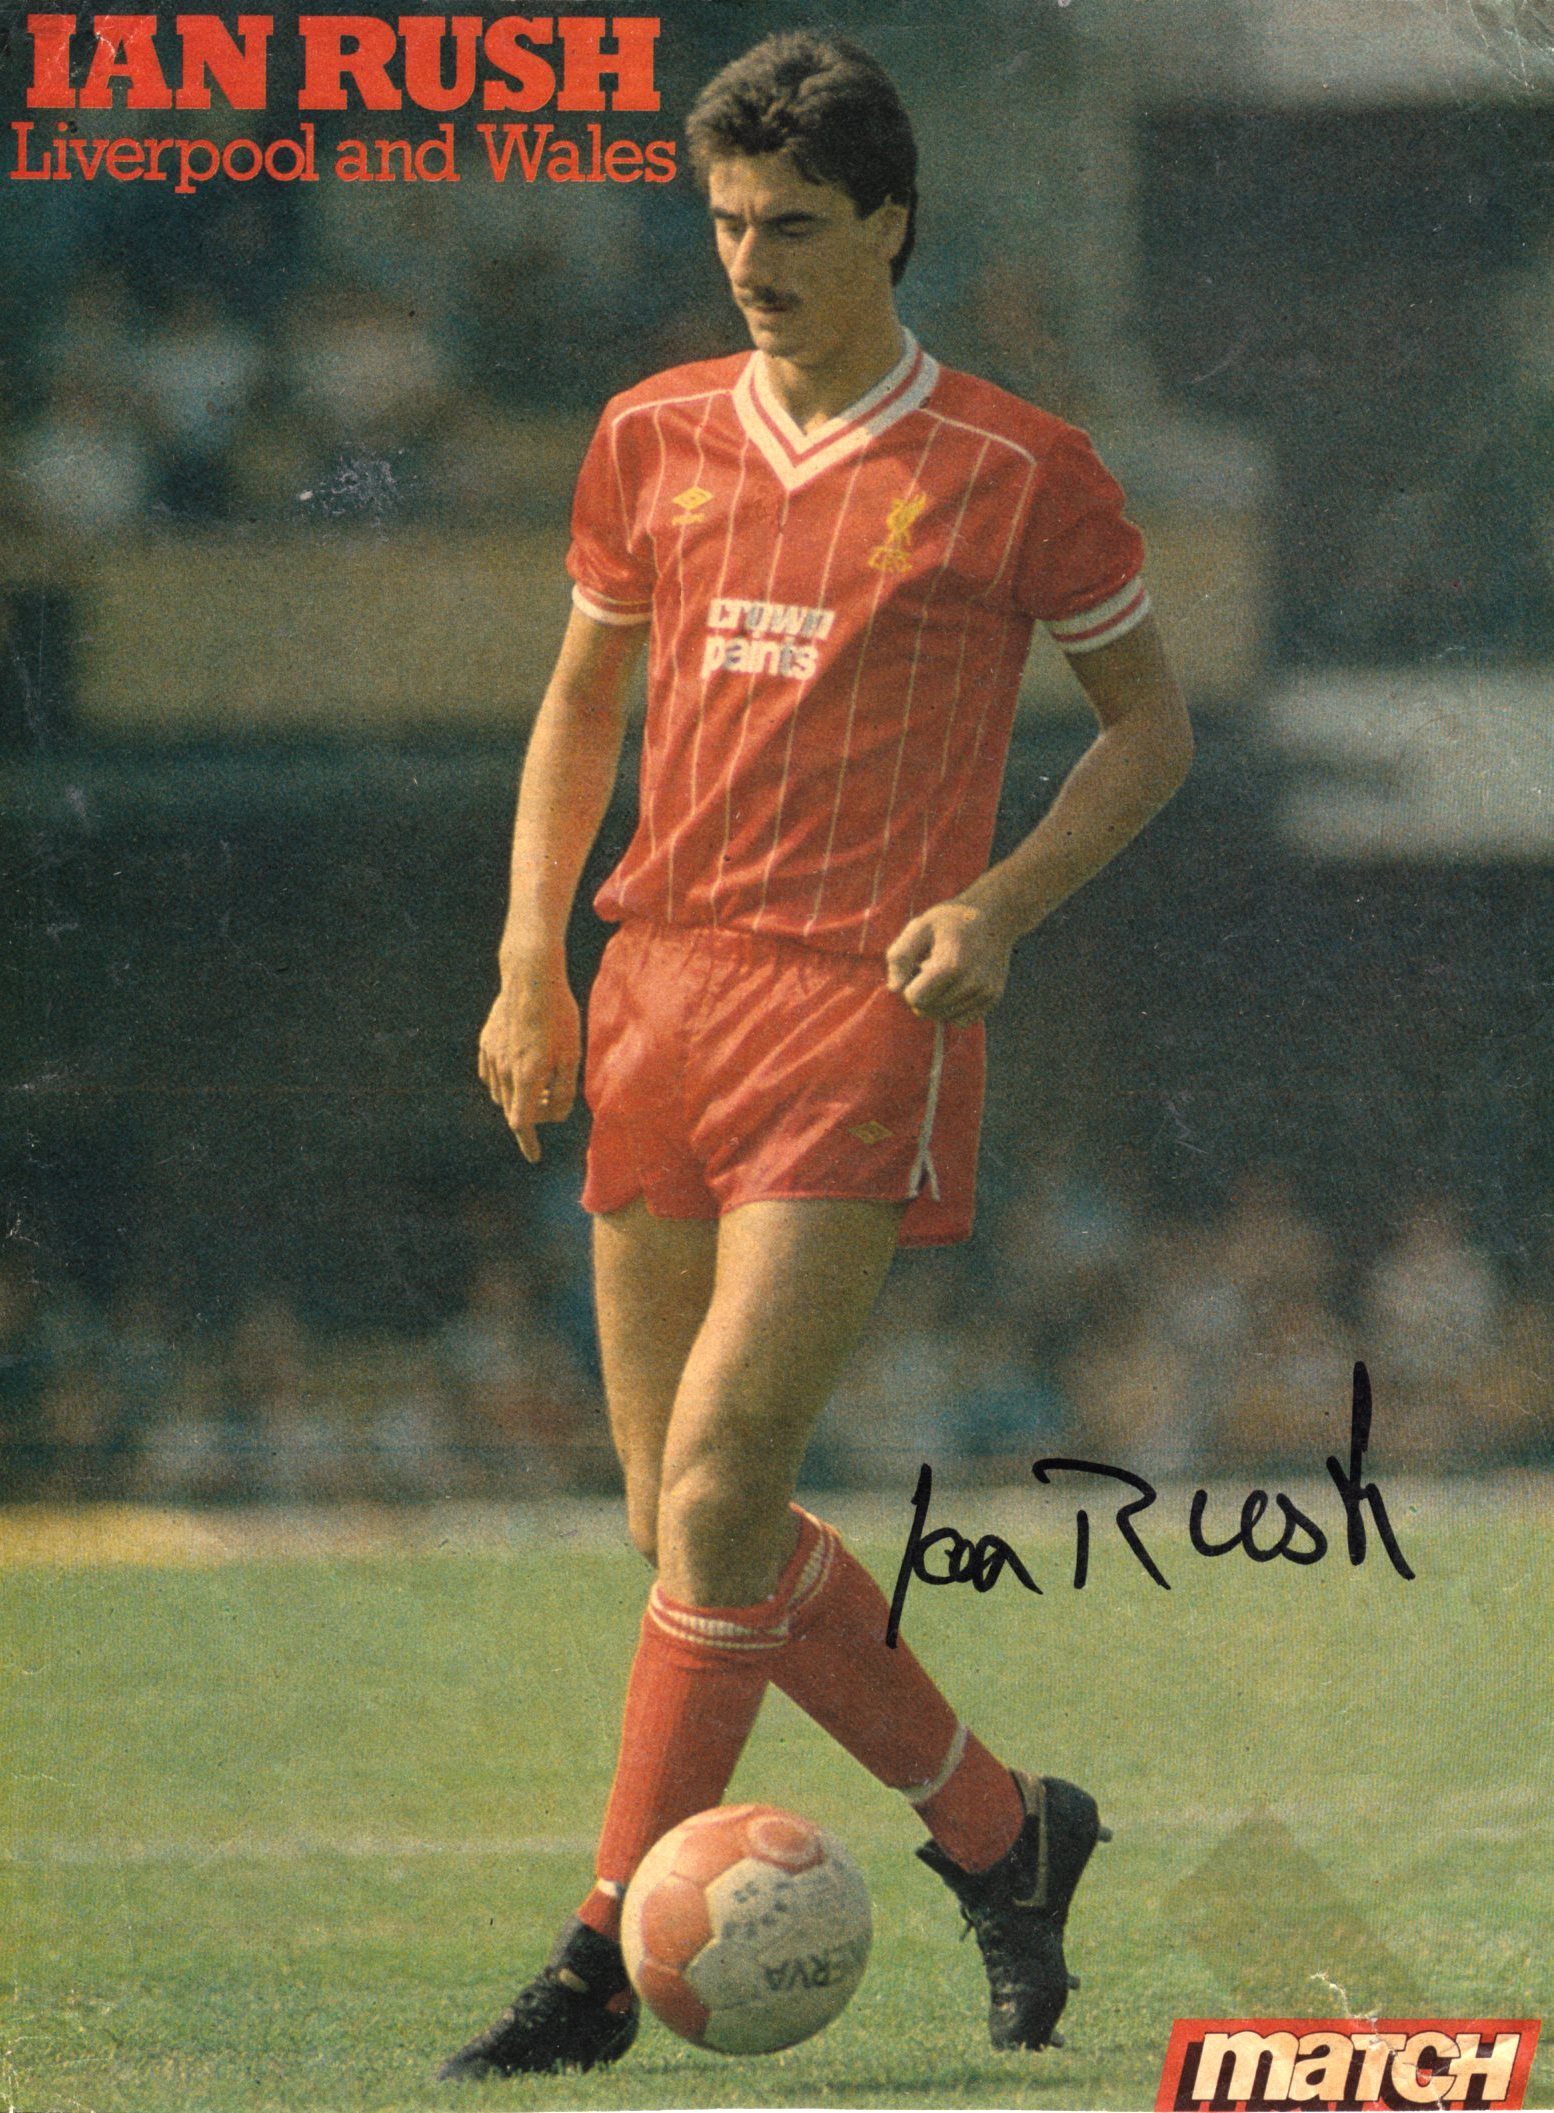 Ian Rush Retro Liverpool Football Player Photo Poster Sport Star Picture Print